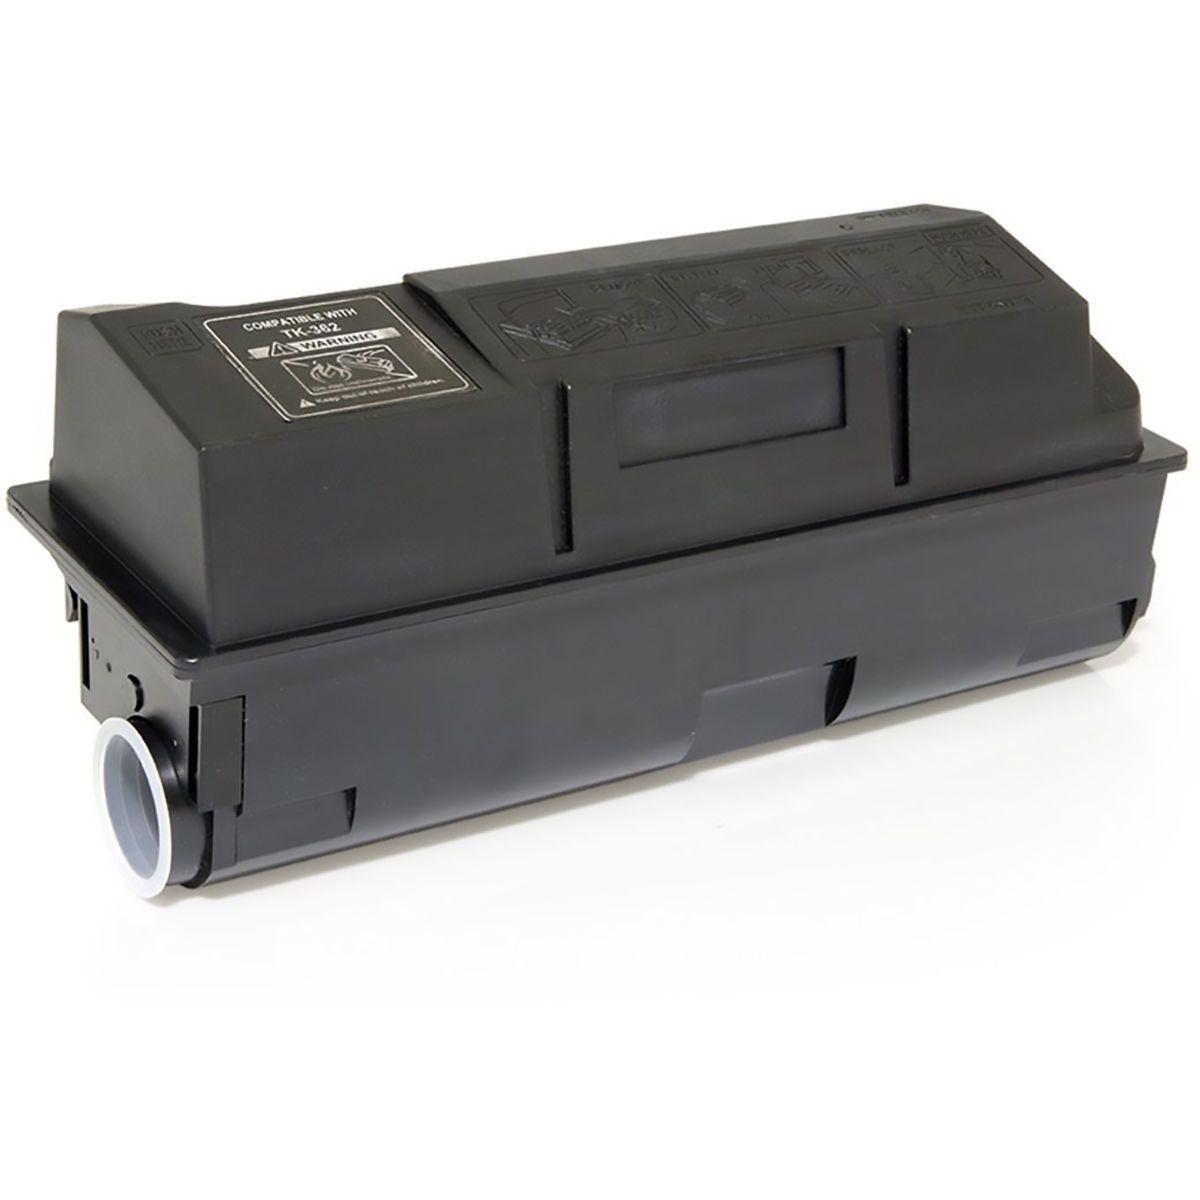 Toner compatível com KYOCERA TK362 TK360 FS 4020D FS4020 20.000 Páginas - Cartucho & Cia